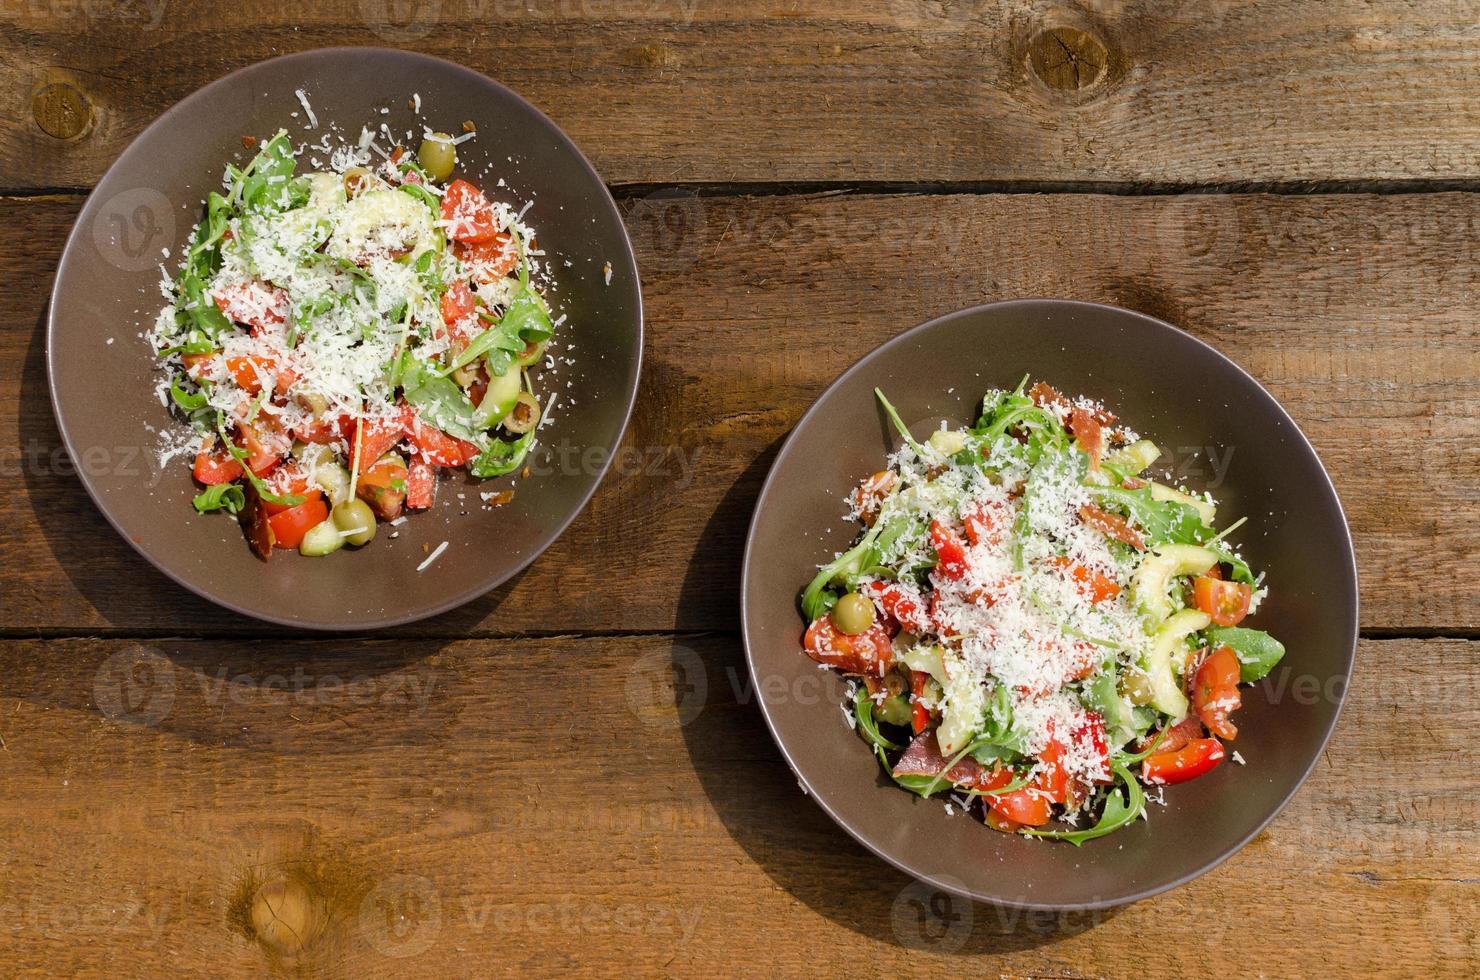 Arugula Salad with tomatoes, olives and parmesan photo